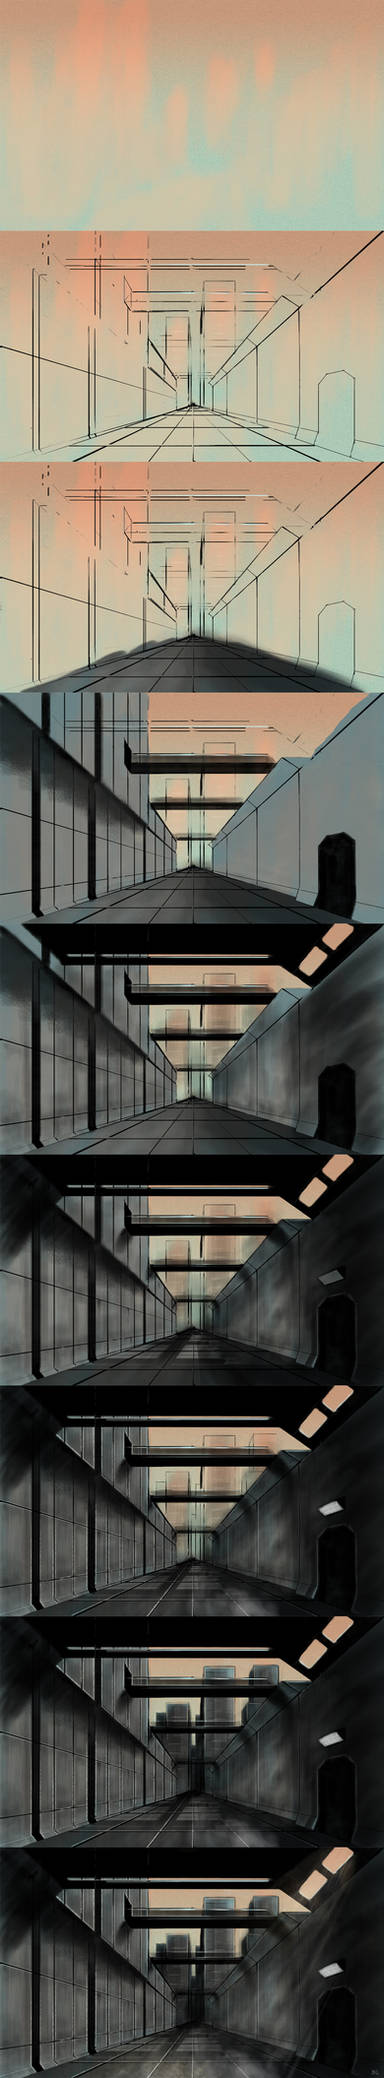 City Concept Steps